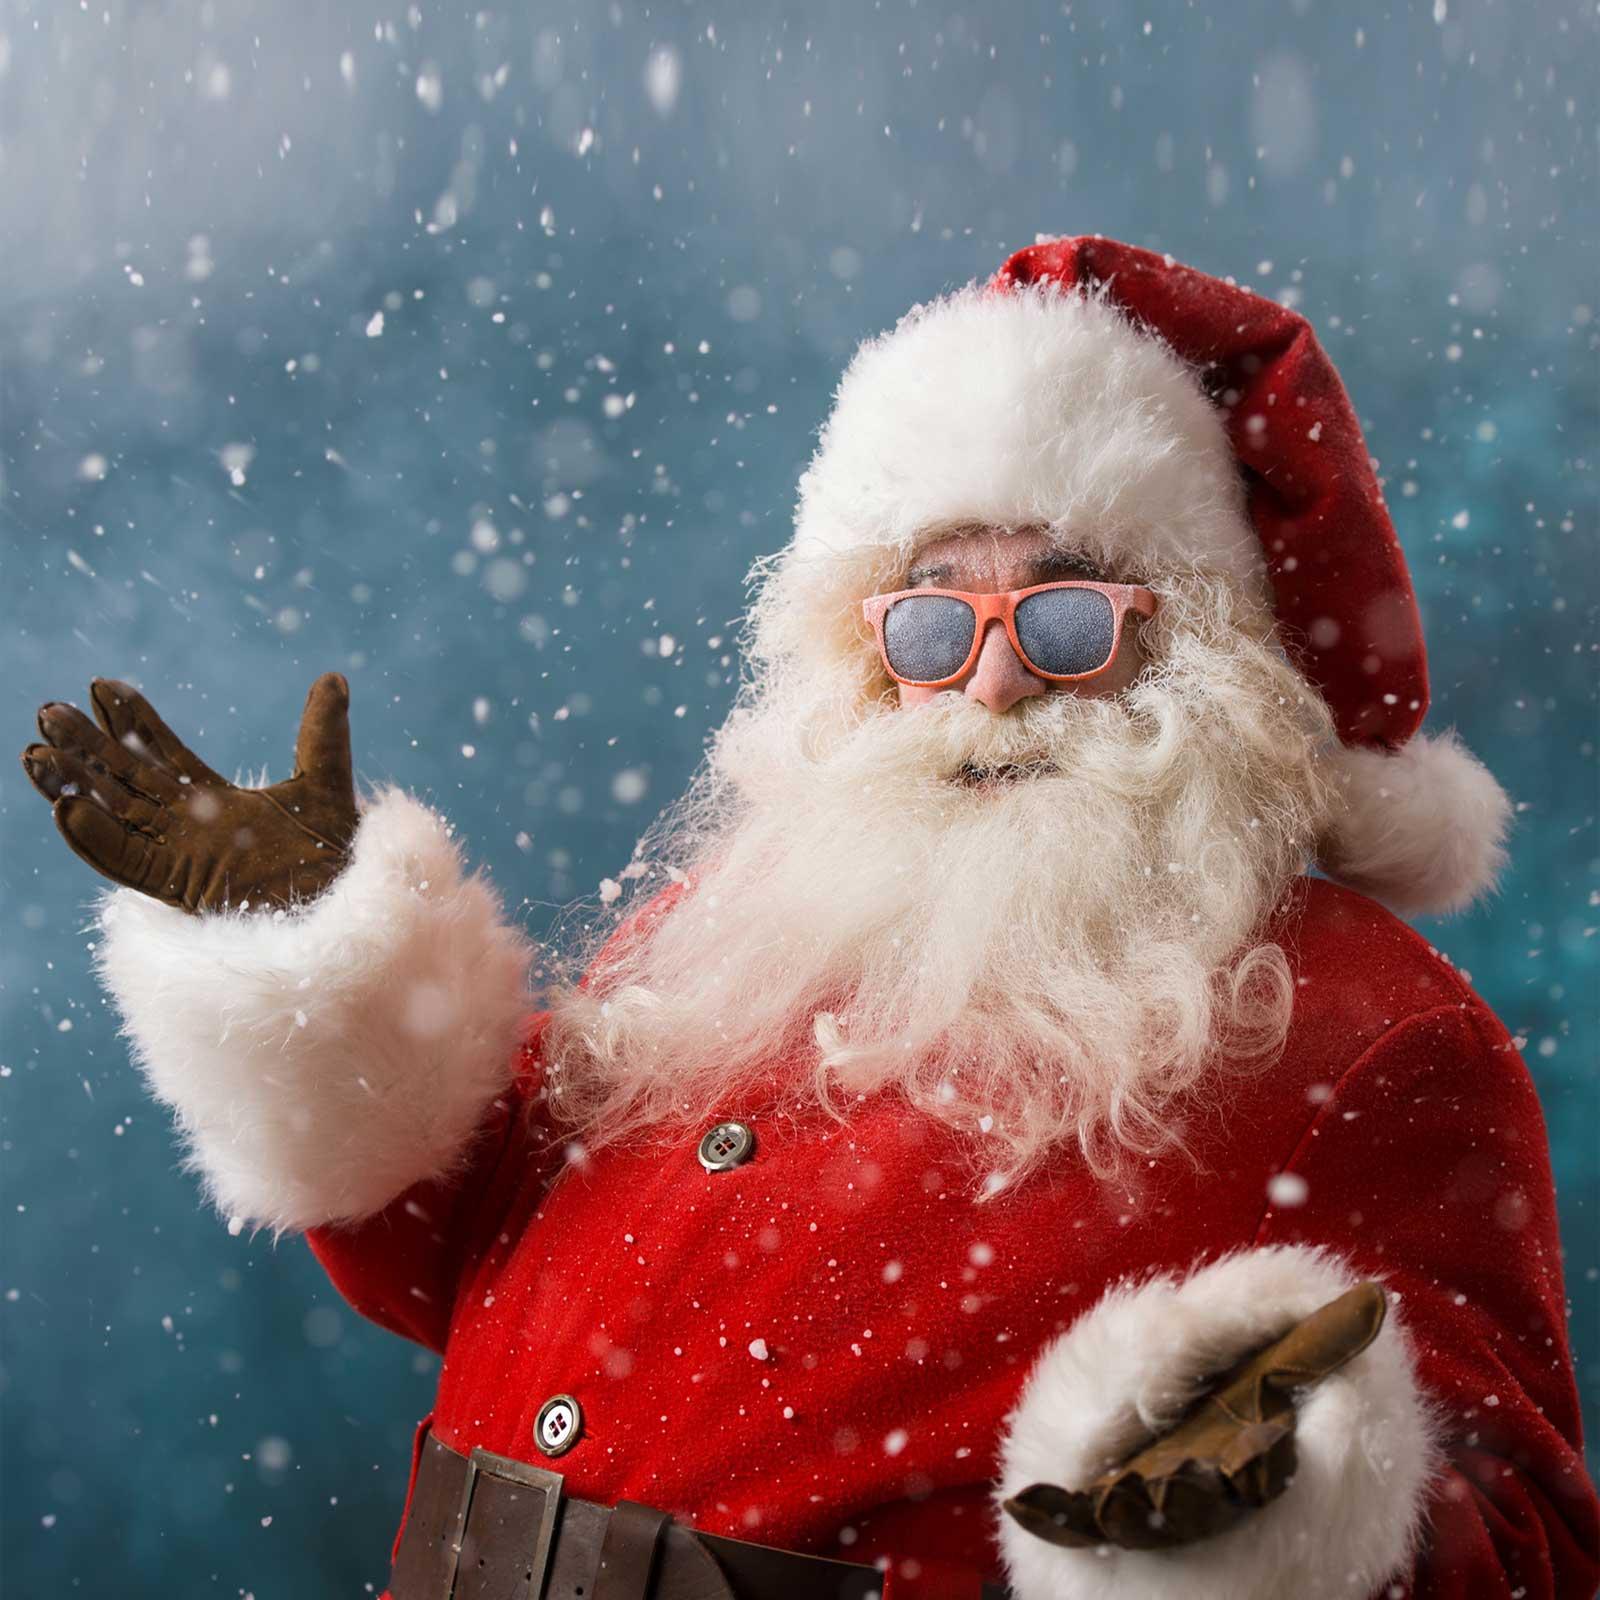 Santa-with-sunglasses.jpg